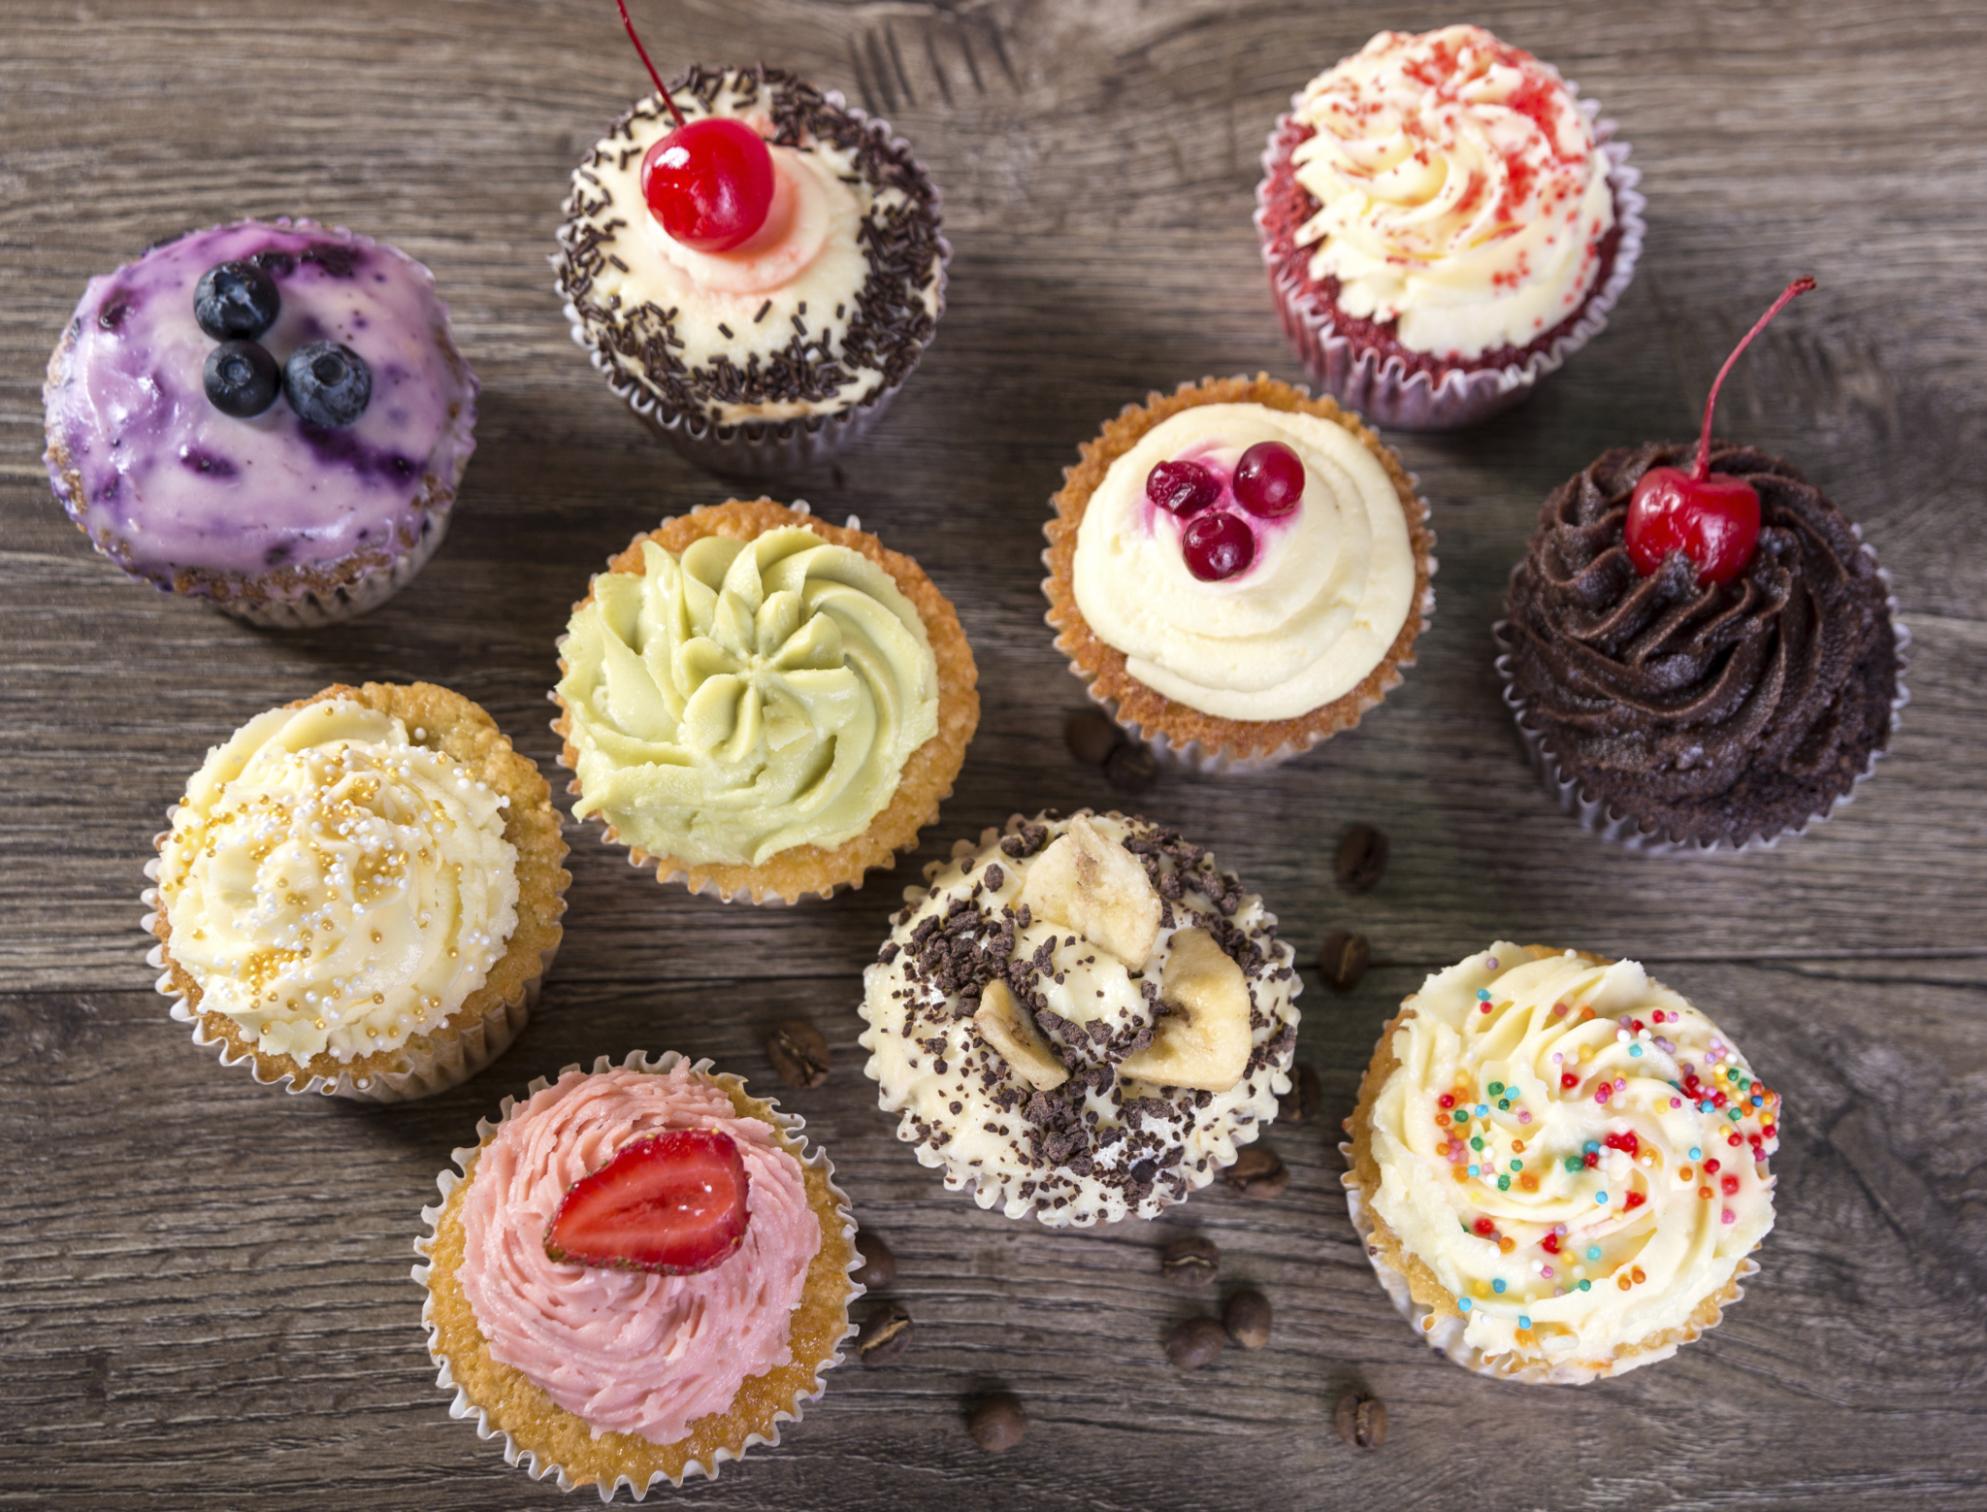 Lecker Cupcakes sind Trend